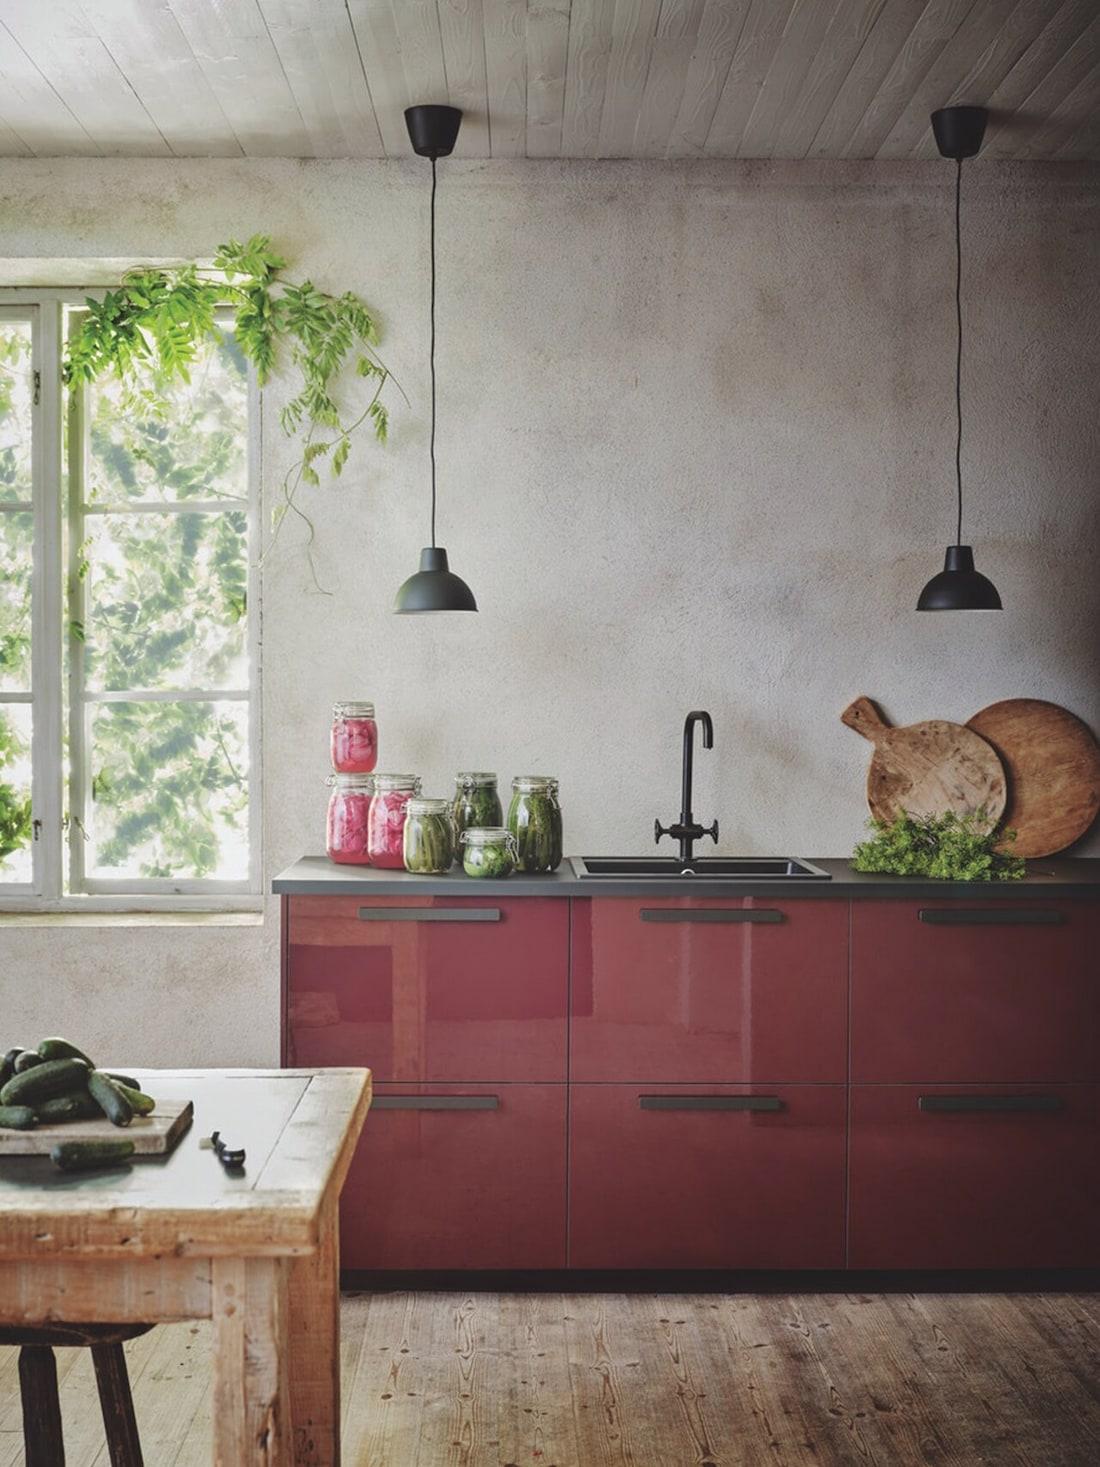 https://www.ikea.com/images/cuisine-brun-rouge-fonce-brillant-ikea-7916c413b5d39b03ada989d0d5a6cdc3.jpg?f=xxl